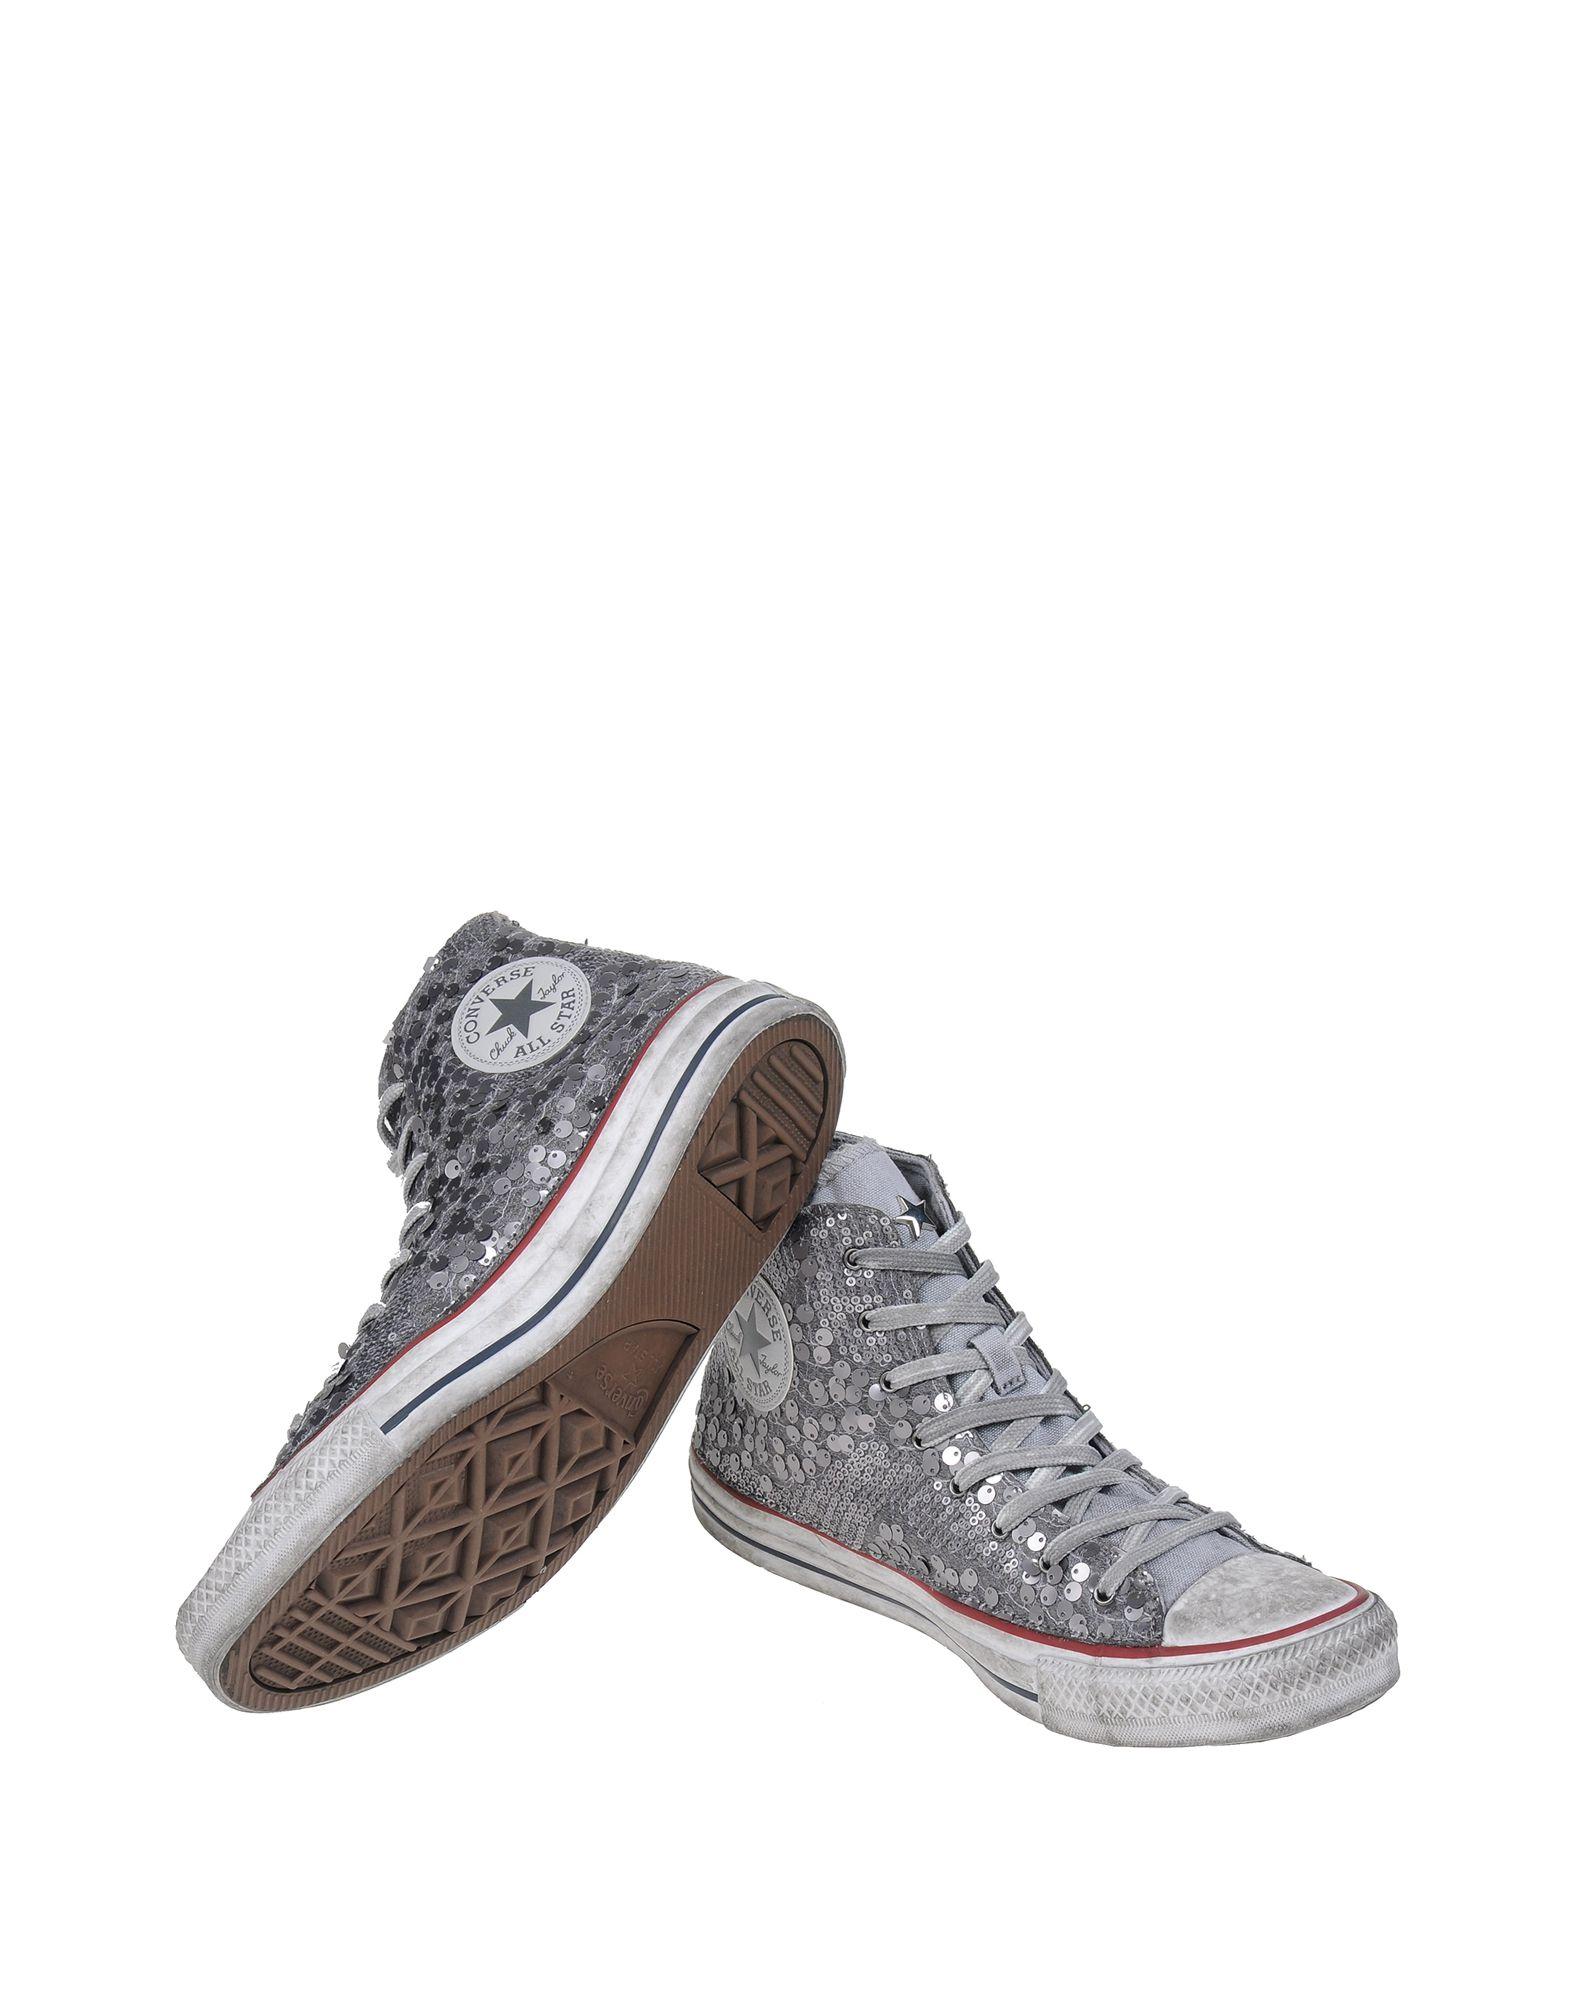 Rabatt All Schuhe Converse Limited Edition All Rabatt Star Hi Canvas Ltd  11095521UF 47a4b9